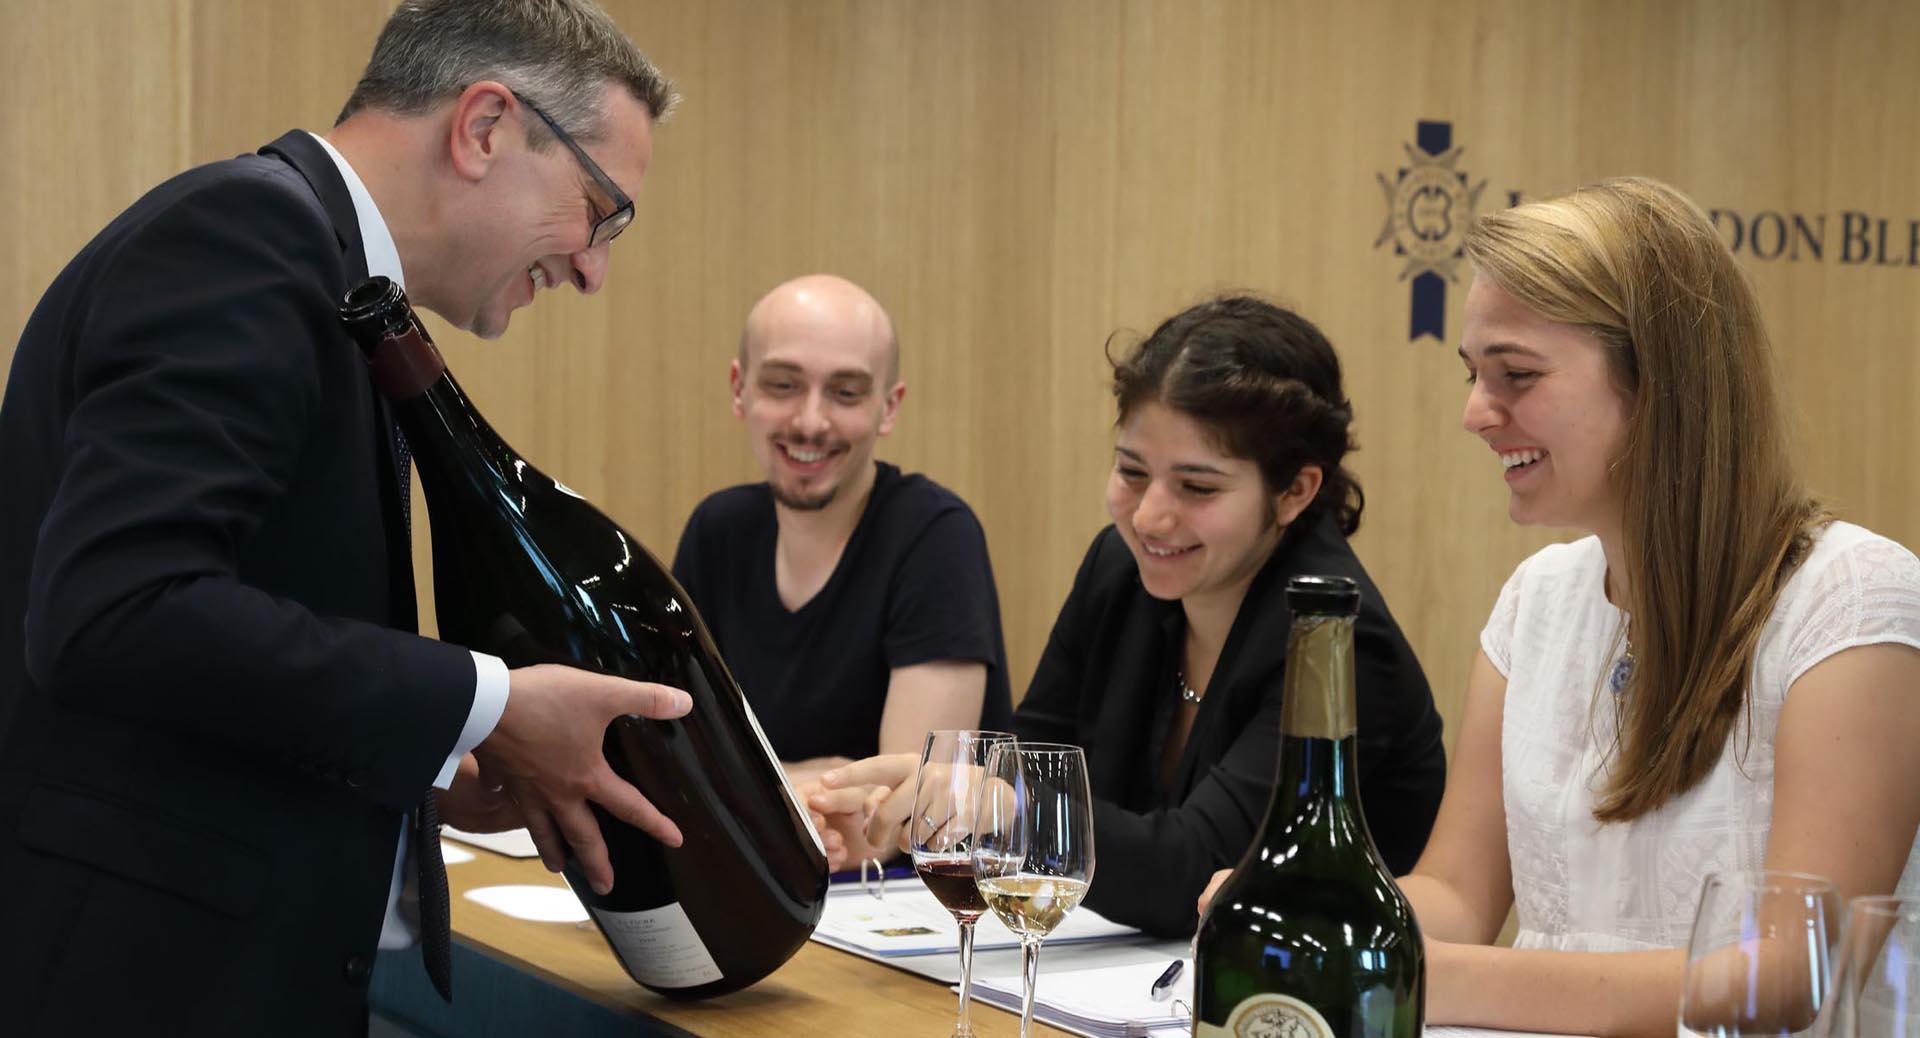 New wine programmes